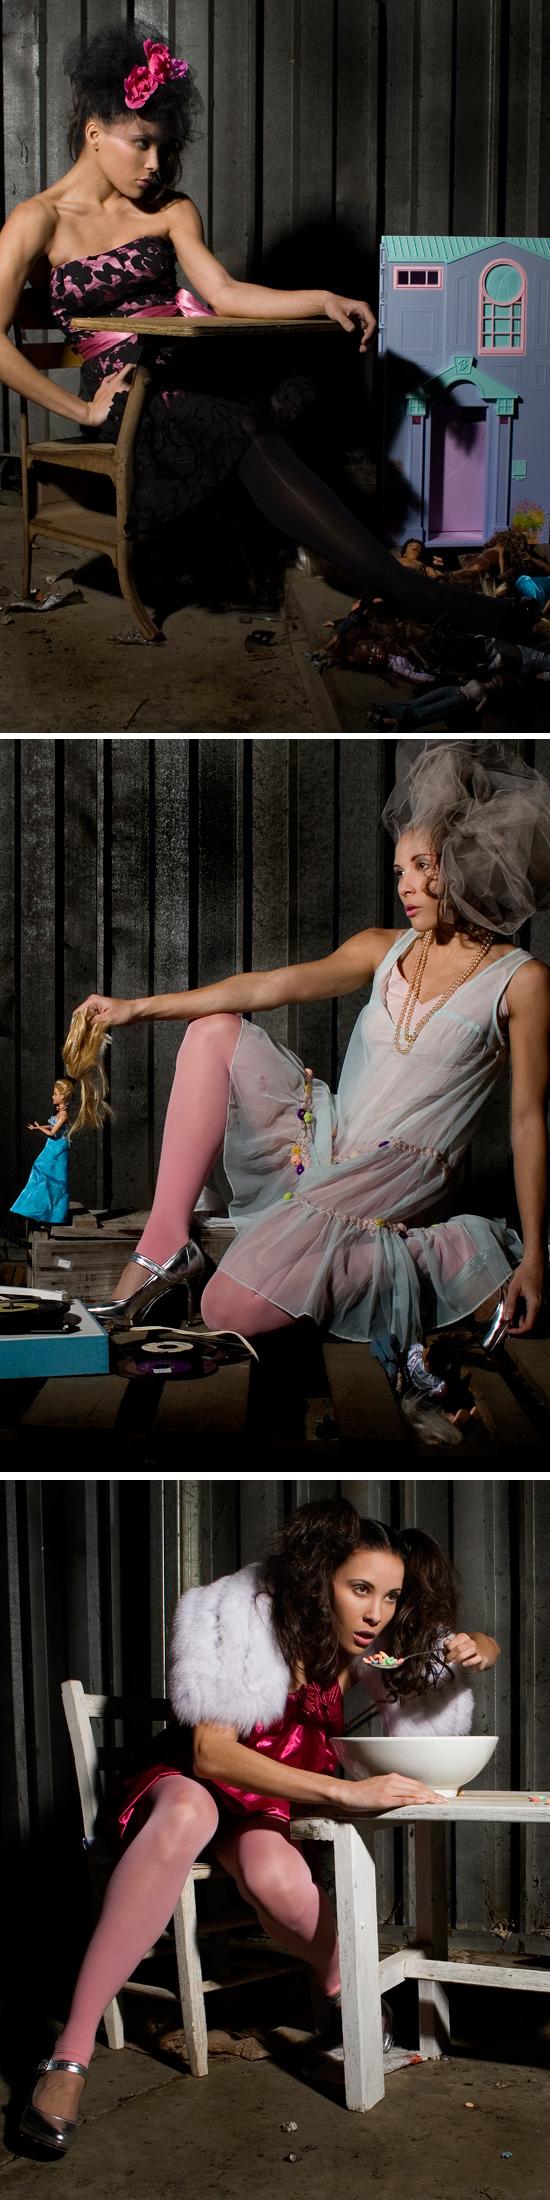 Germany Feb 03, 2008 Photography, Hair & Styling: Laretta Houston | MUA & Styling: Mimi J  The Inner Child